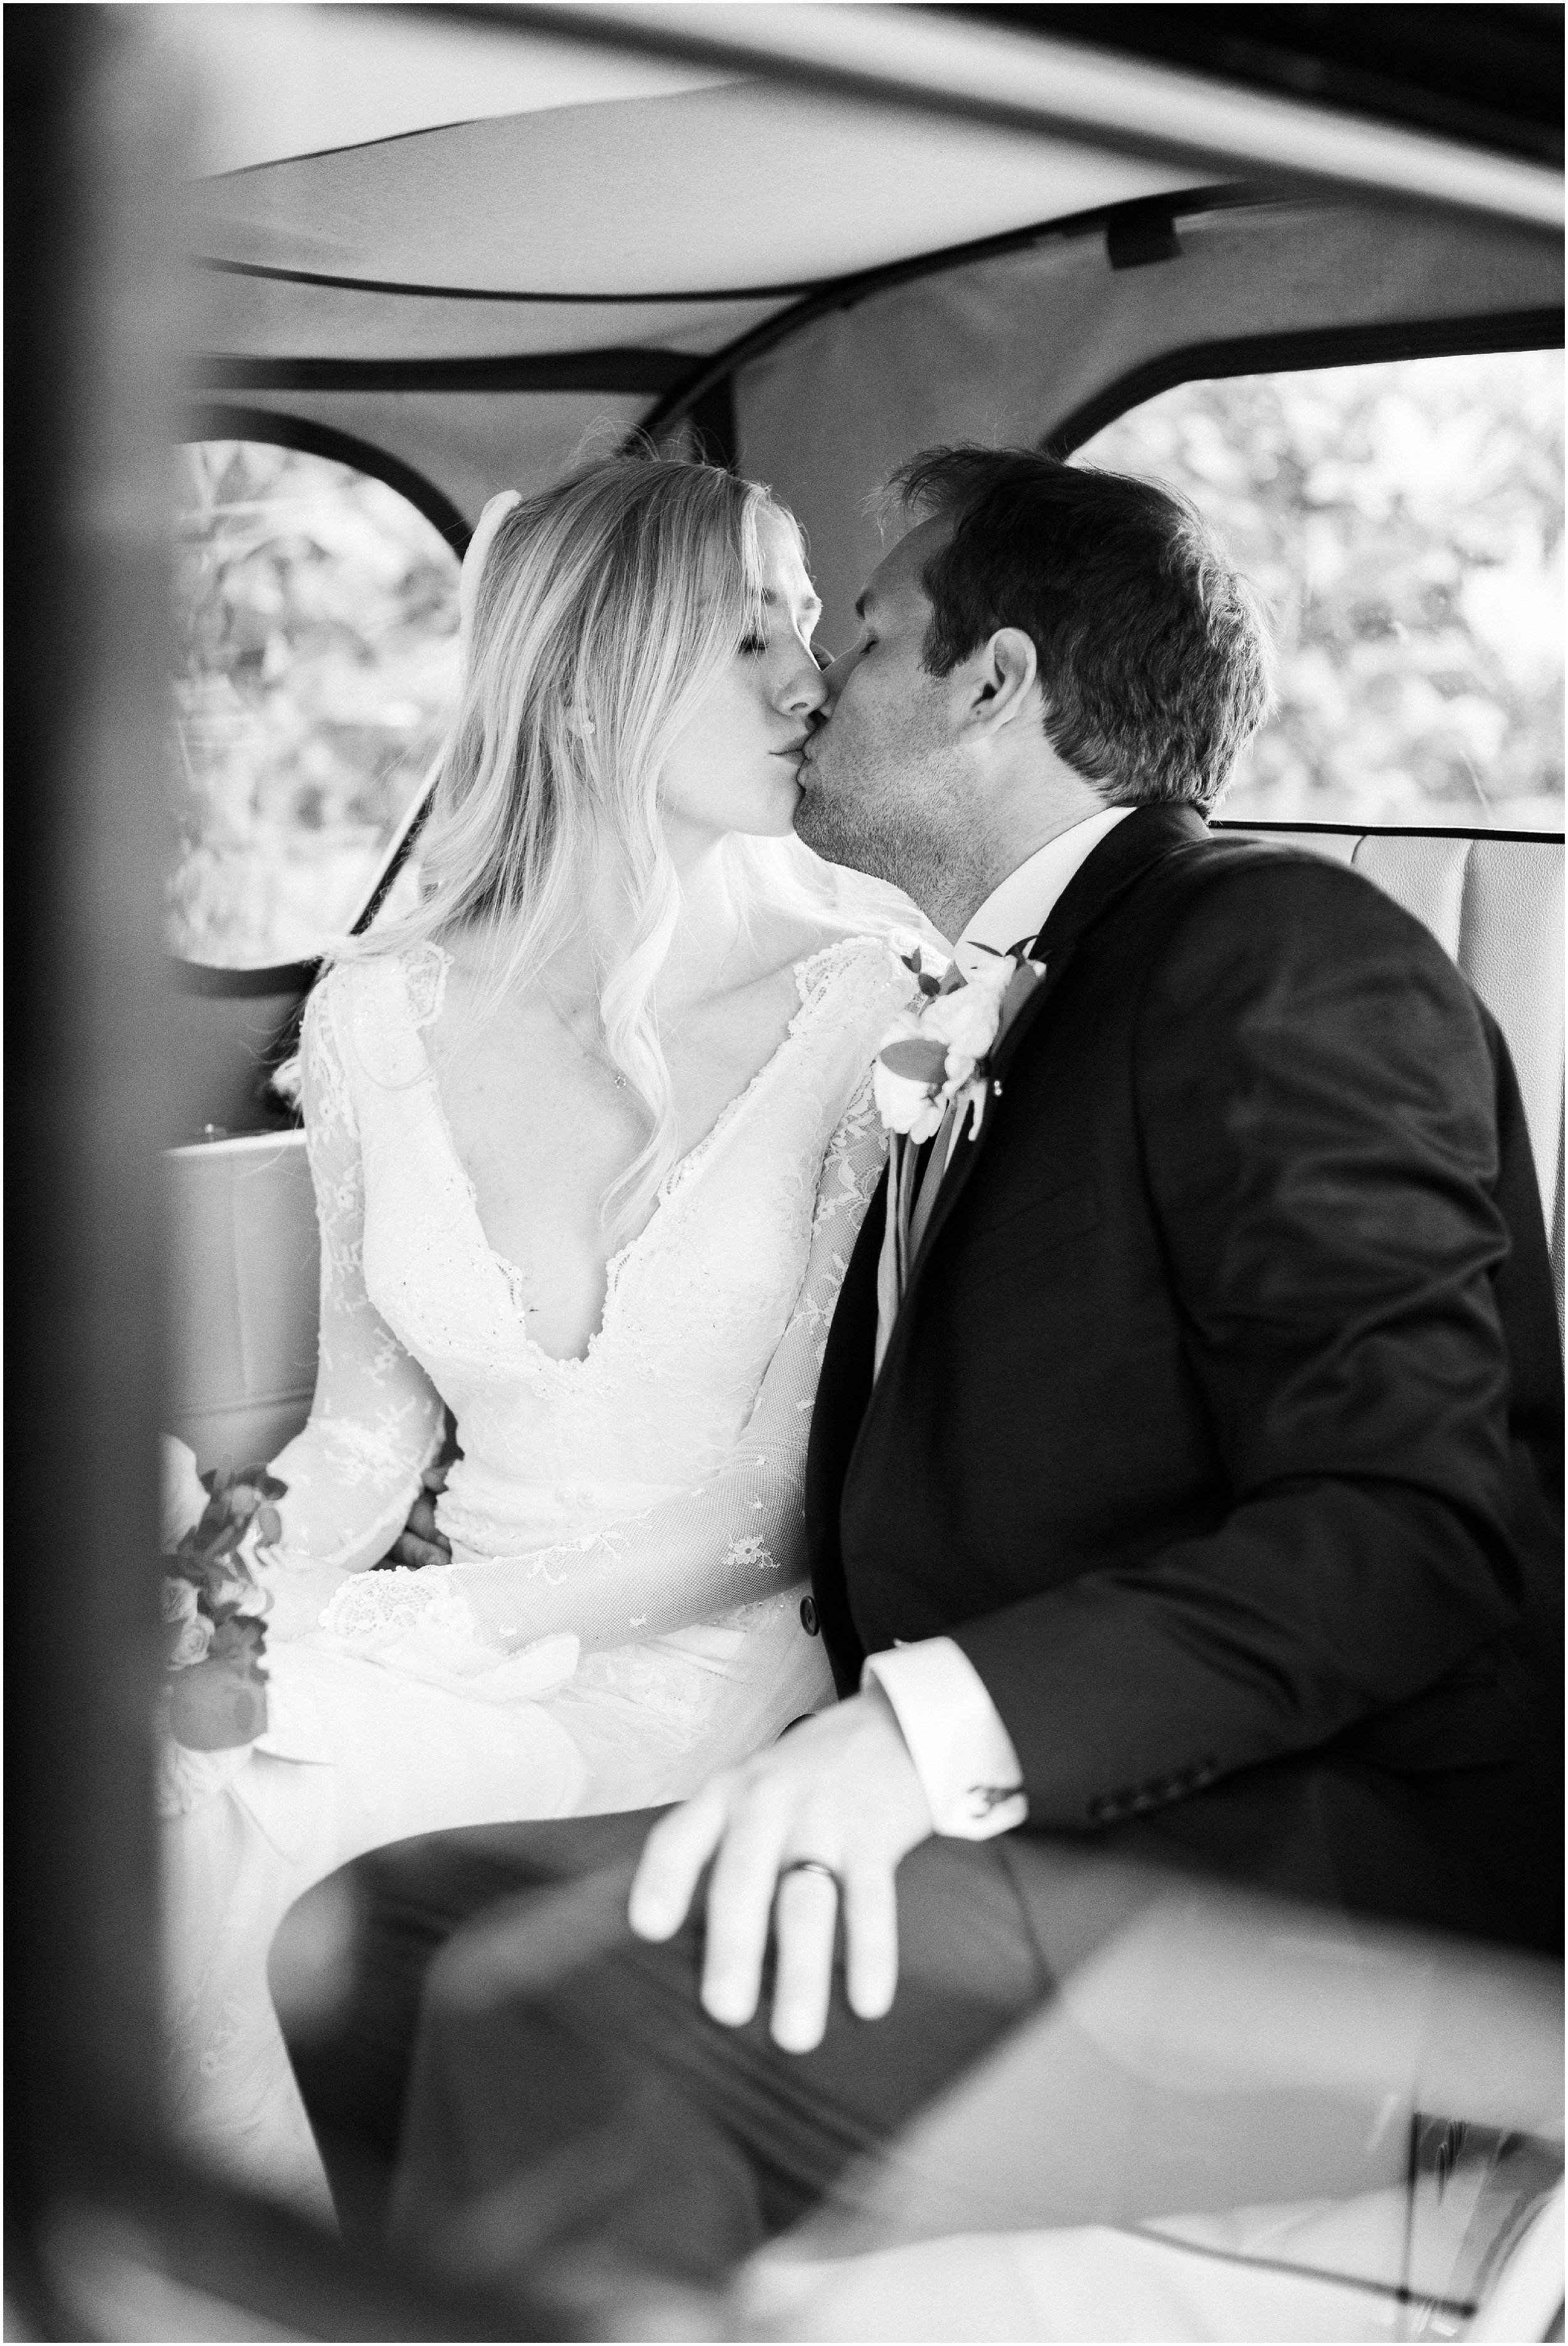 Wedding Photography in Getaway Car